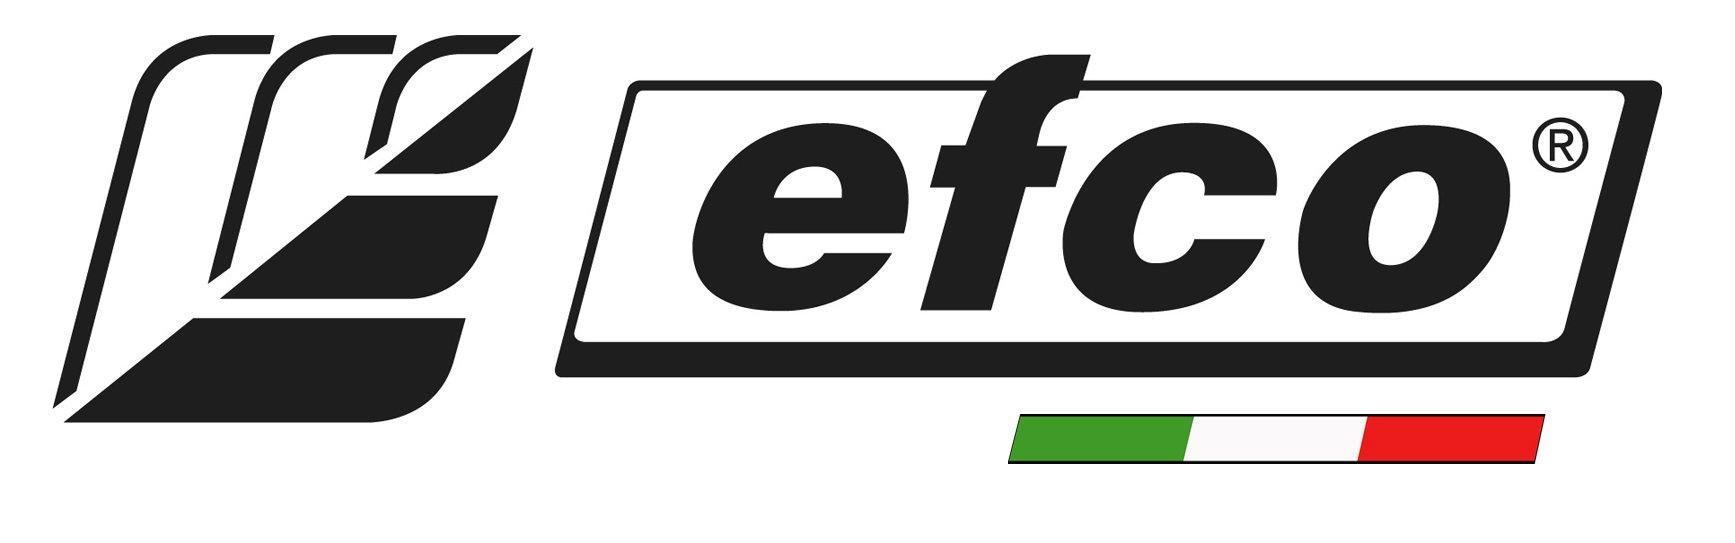 efco-mt4100s-chainsaw-[2]-2145-p.jpg